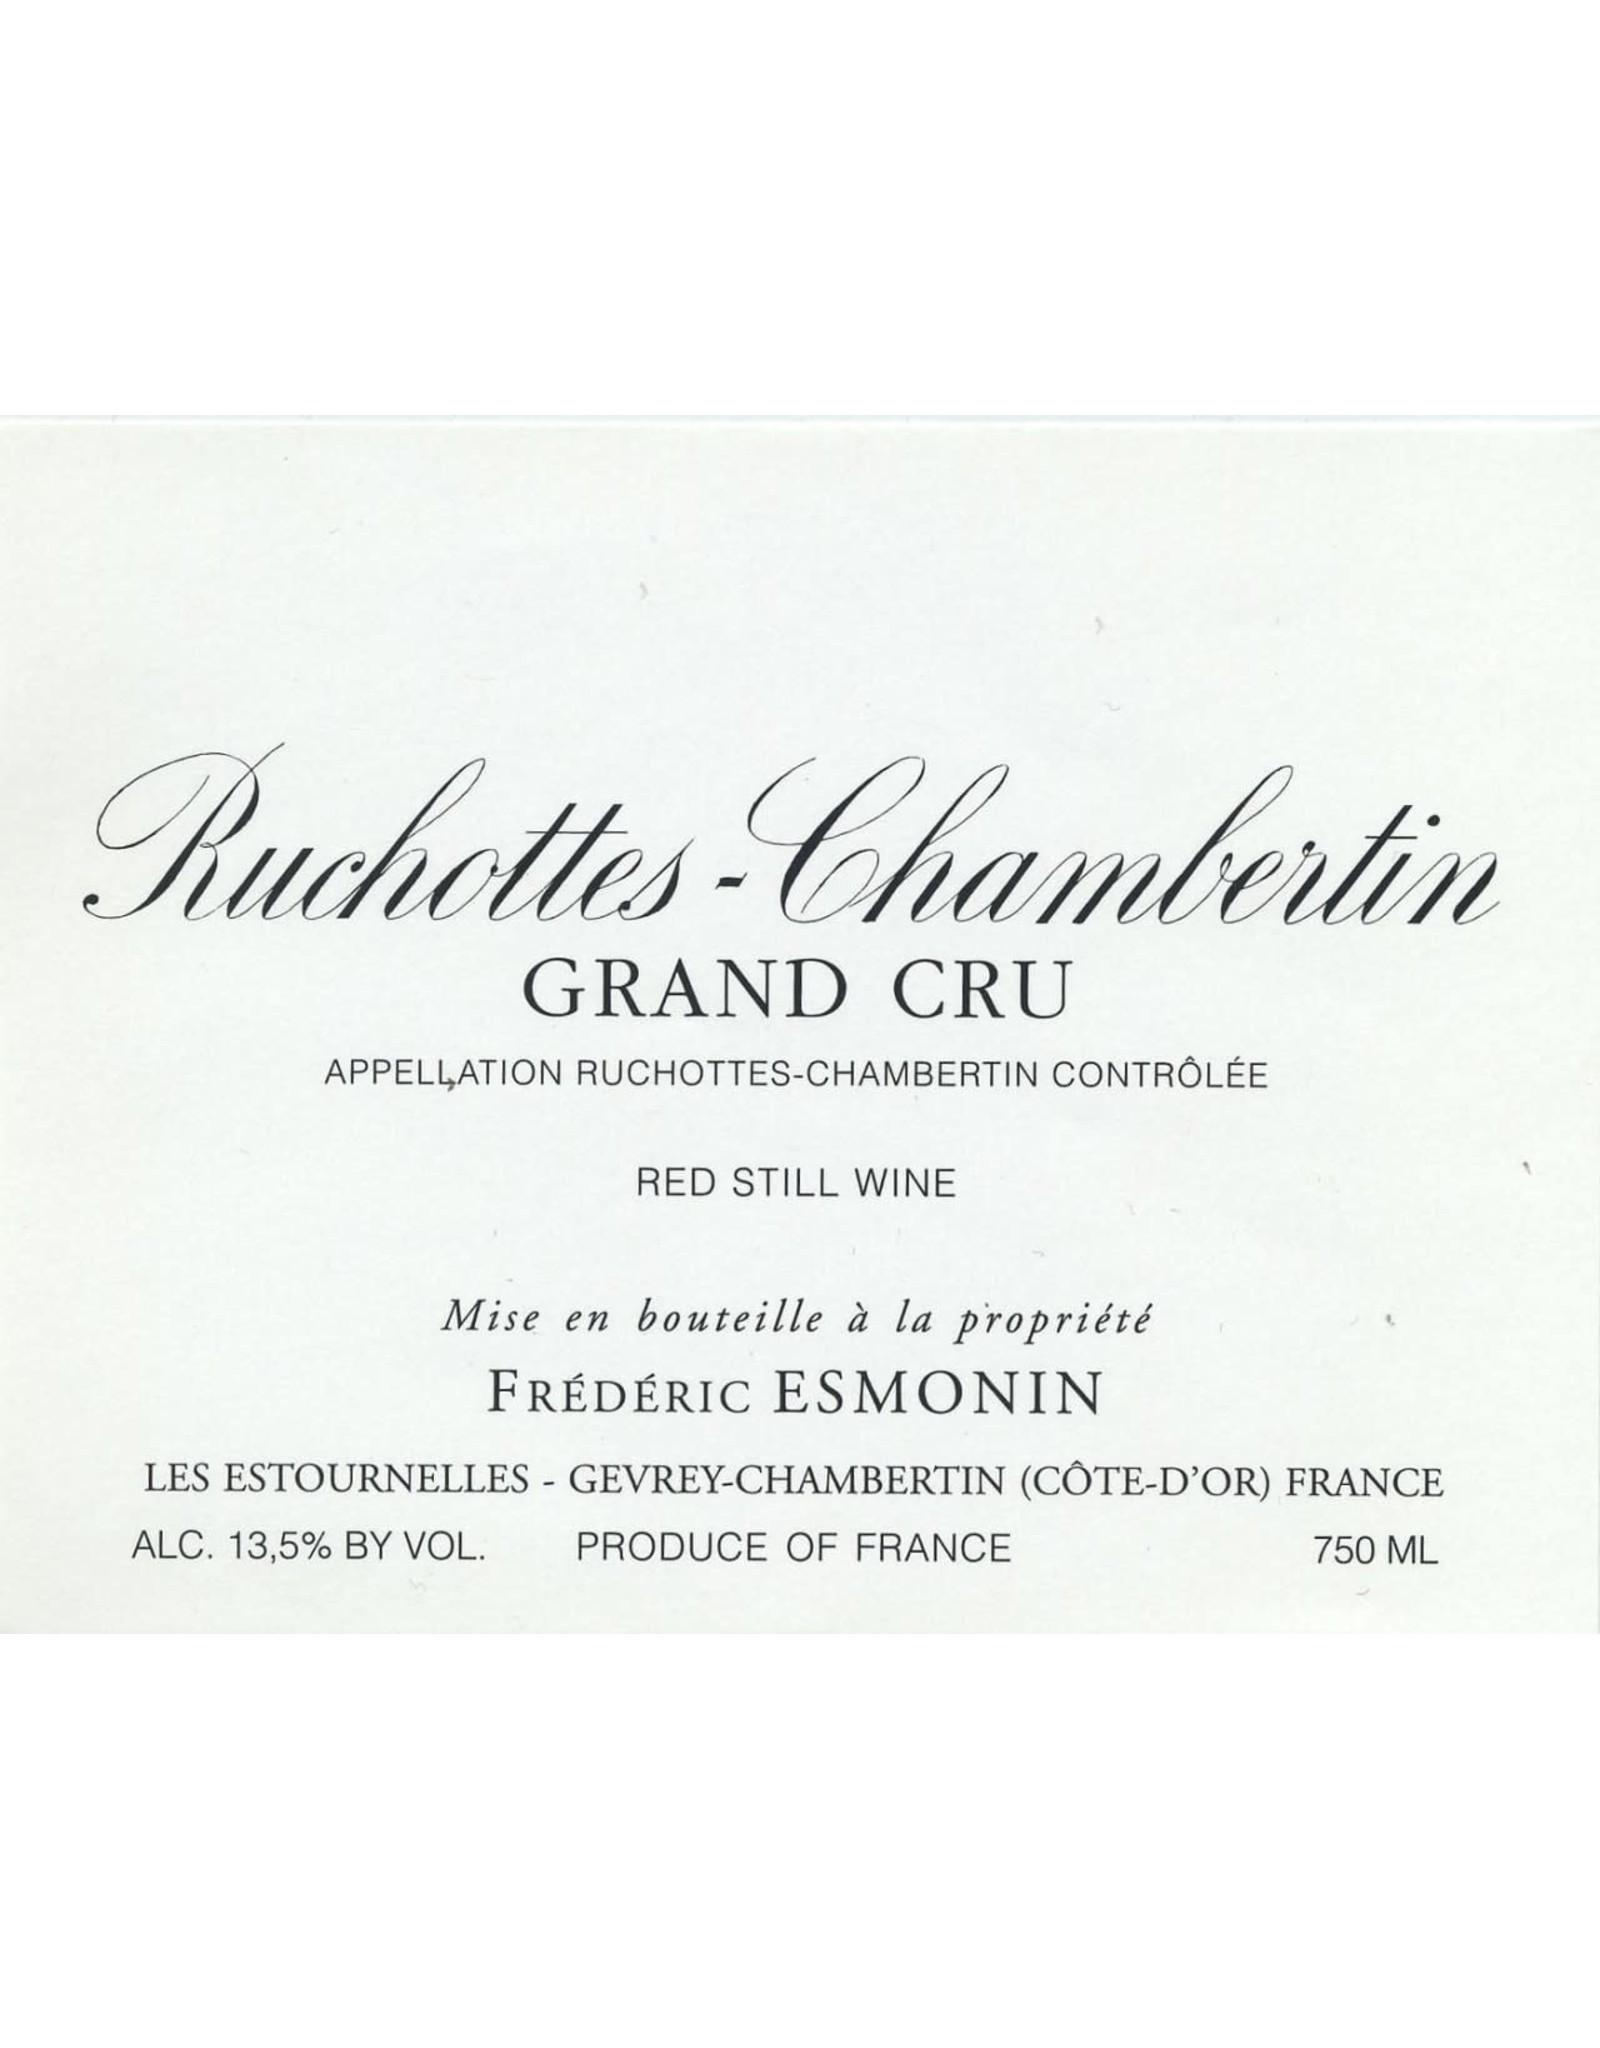 Frederic Esmonin Ruchottes-Chambertin Grand Cru, Burgundy 2017